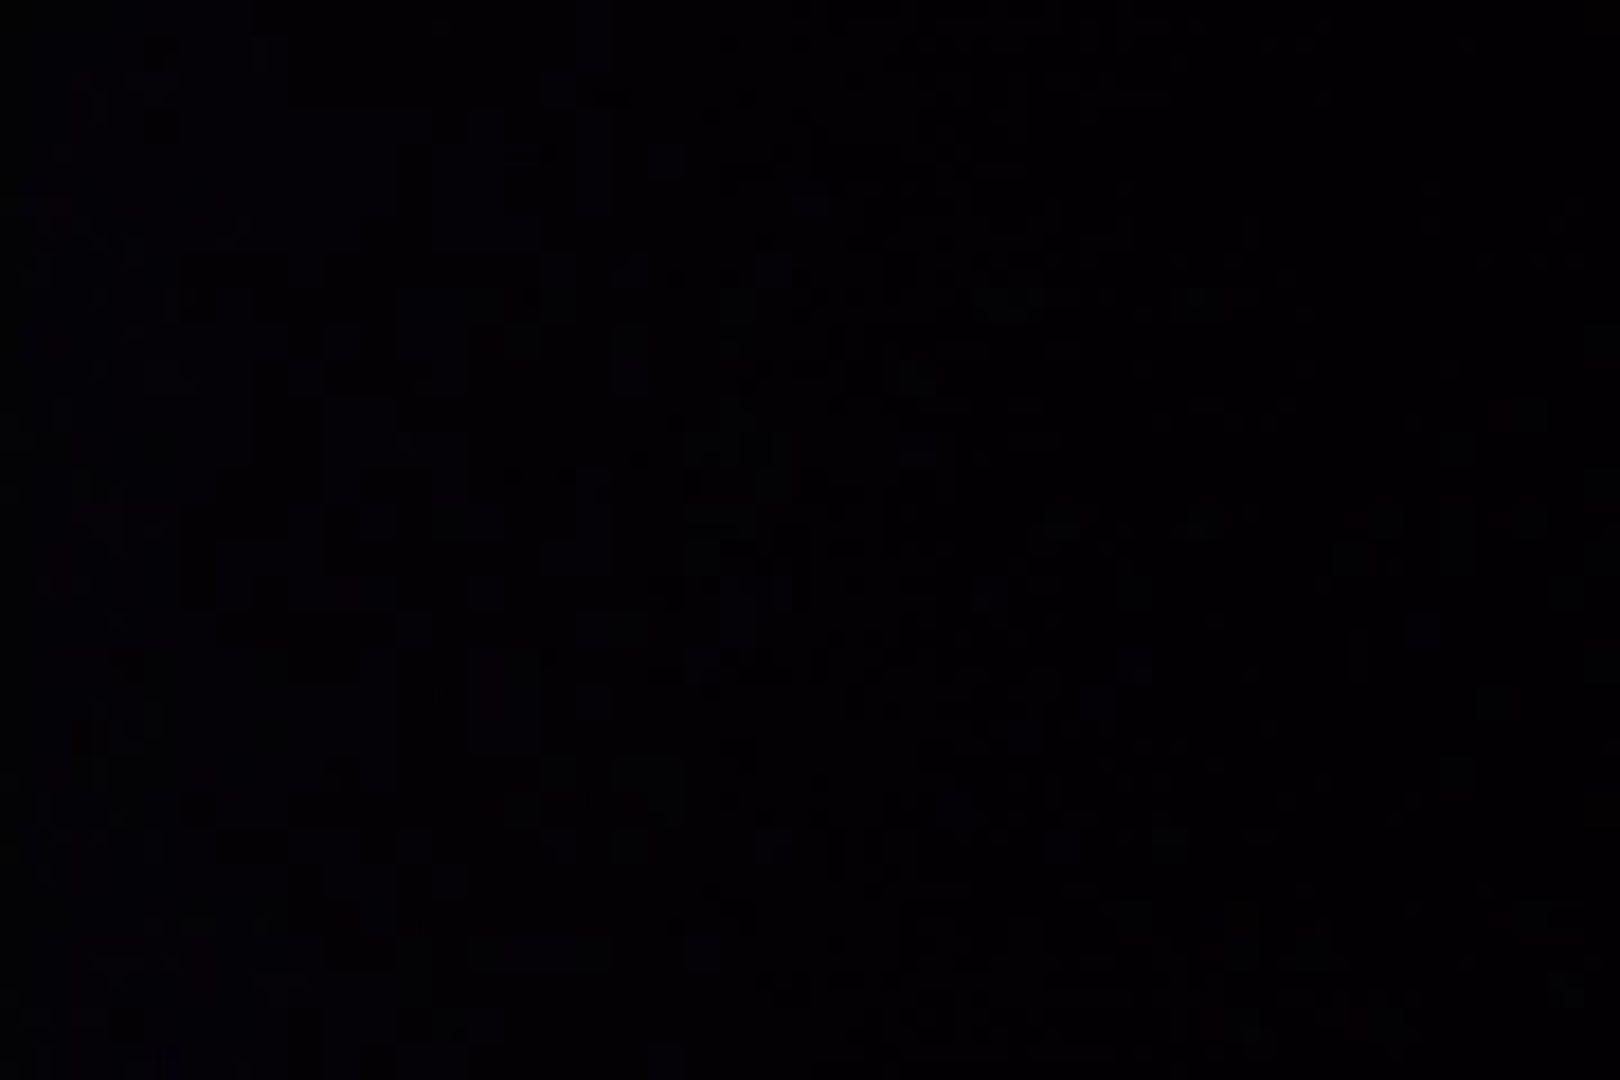 STY-016 女子大生●盗撮 お便所百選・百態の職人芸 女子大生丸裸   便所  98pic 52